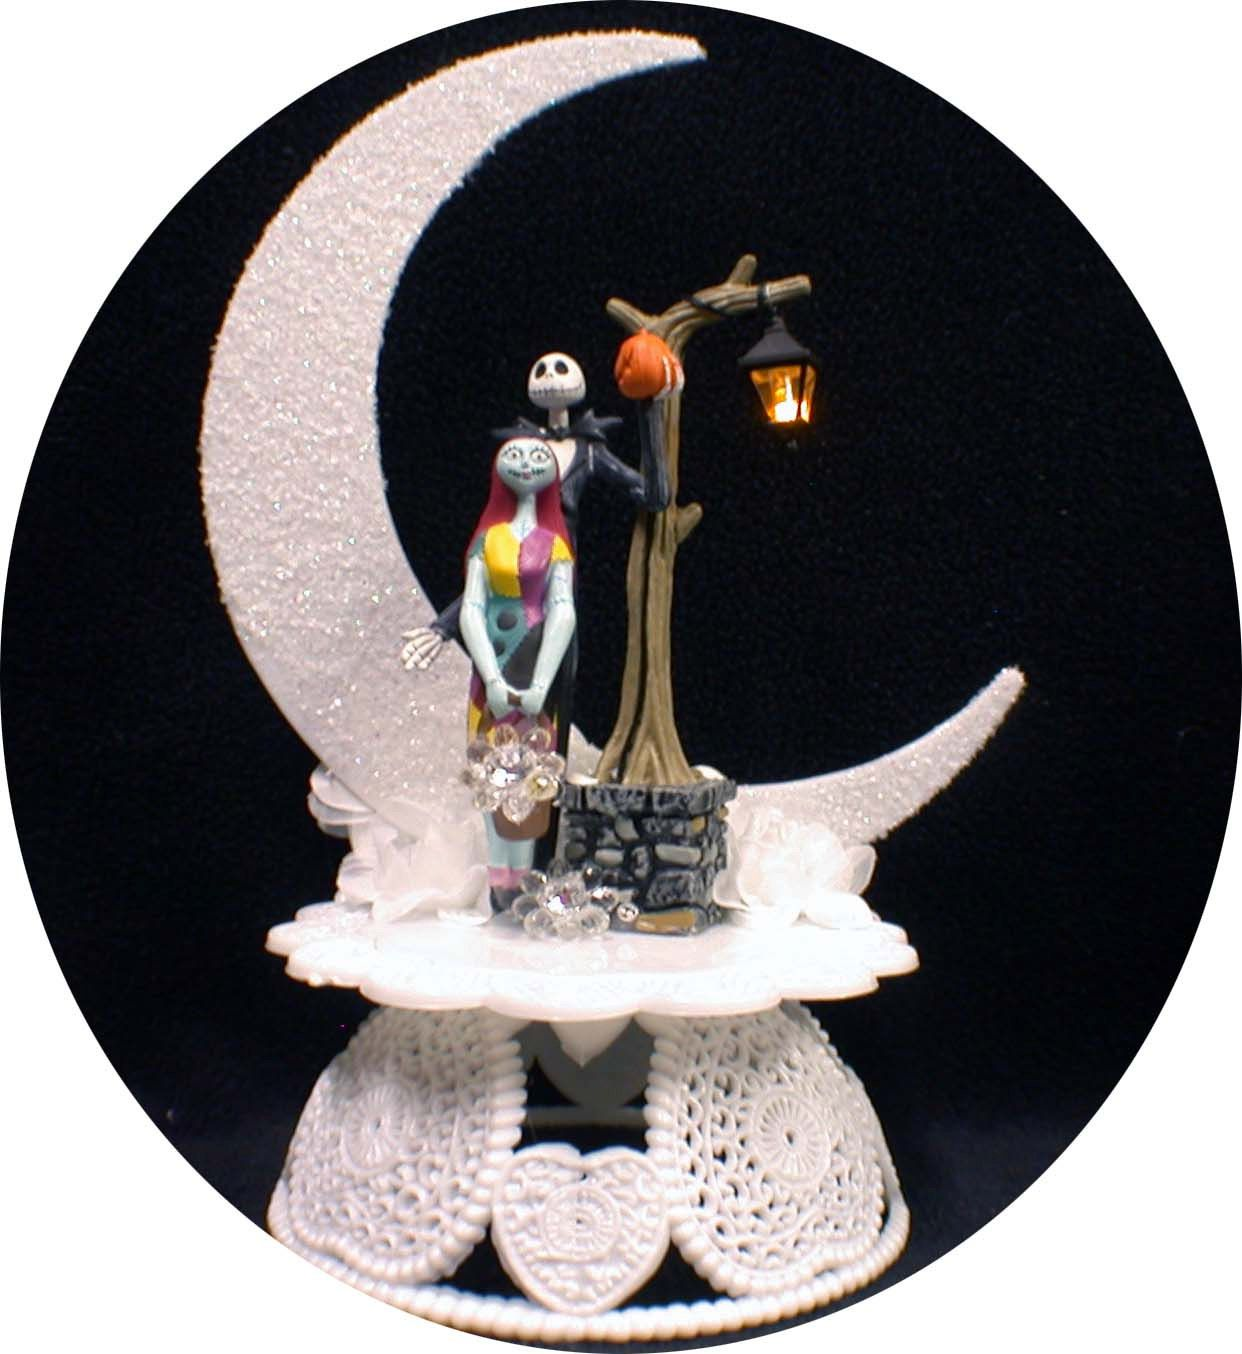 Comfortable Fall Wedding Cakes Small Wedding Cake Serving Set Rectangular Wedding Cake Recipe Wedding Cake Pictures Young Disney Wedding Cake Toppers FreshAverage Wedding Cake Cost Nightmare Before Christmas Wedding Cake Topper By YourCakeTopper ..